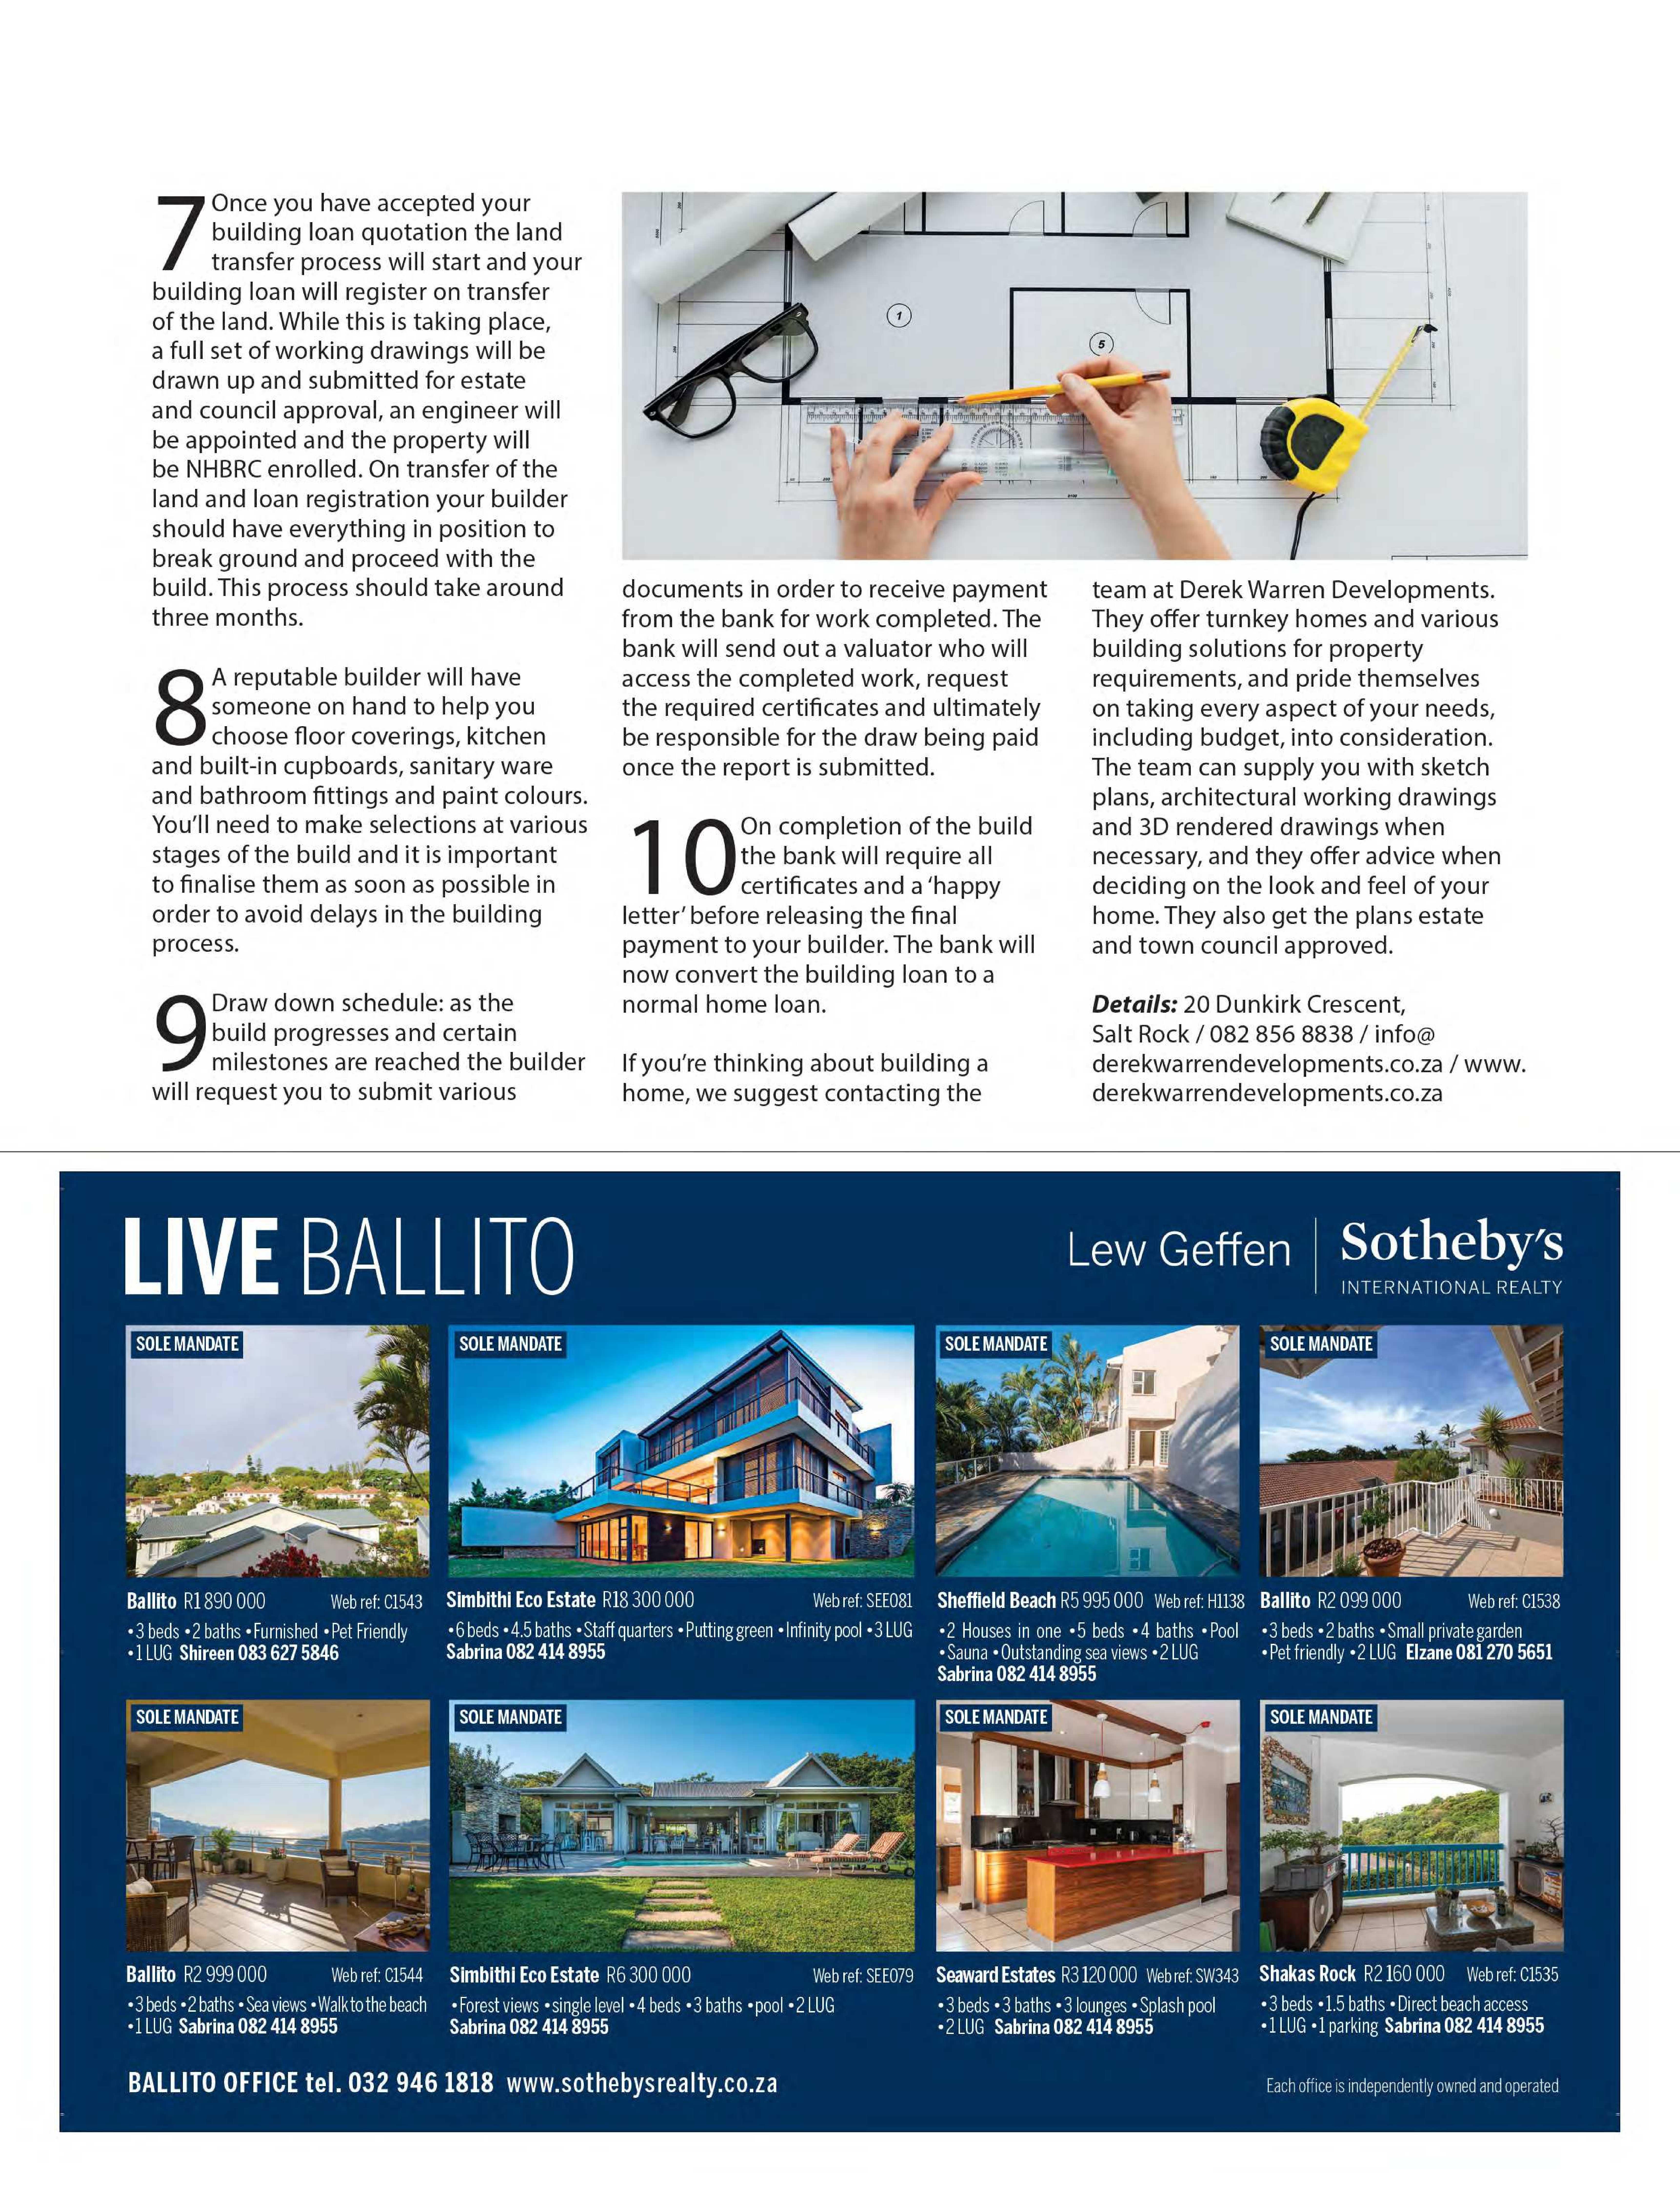 get-magazine-ballitoumhlanga-july-2018-epapers-page-43